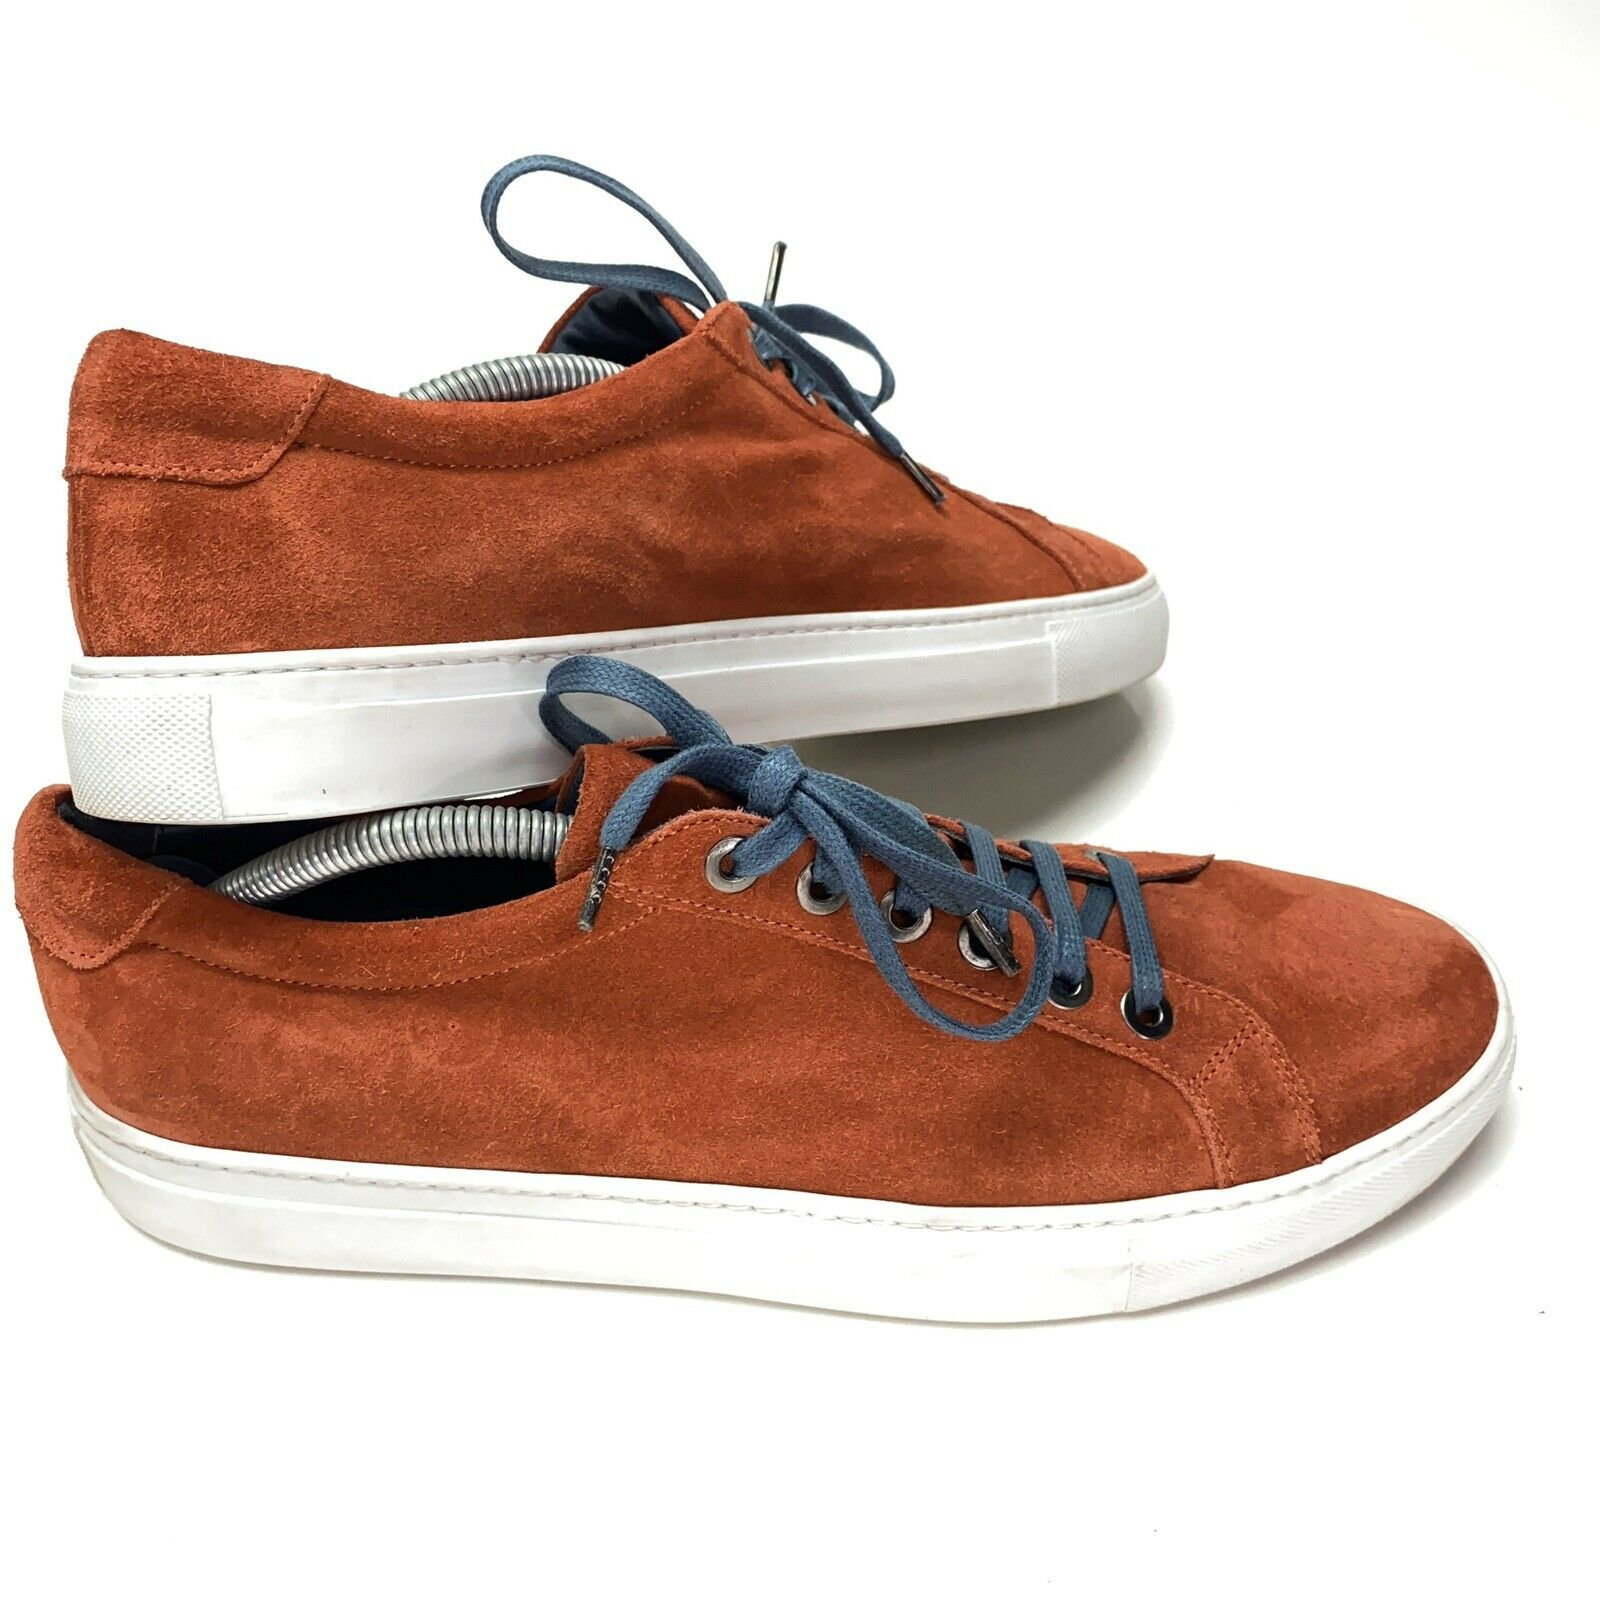 Andrea Zori Mens US 12 EU 45 Salmon Orange Red Italy Suede Sneaker Shoes 19212